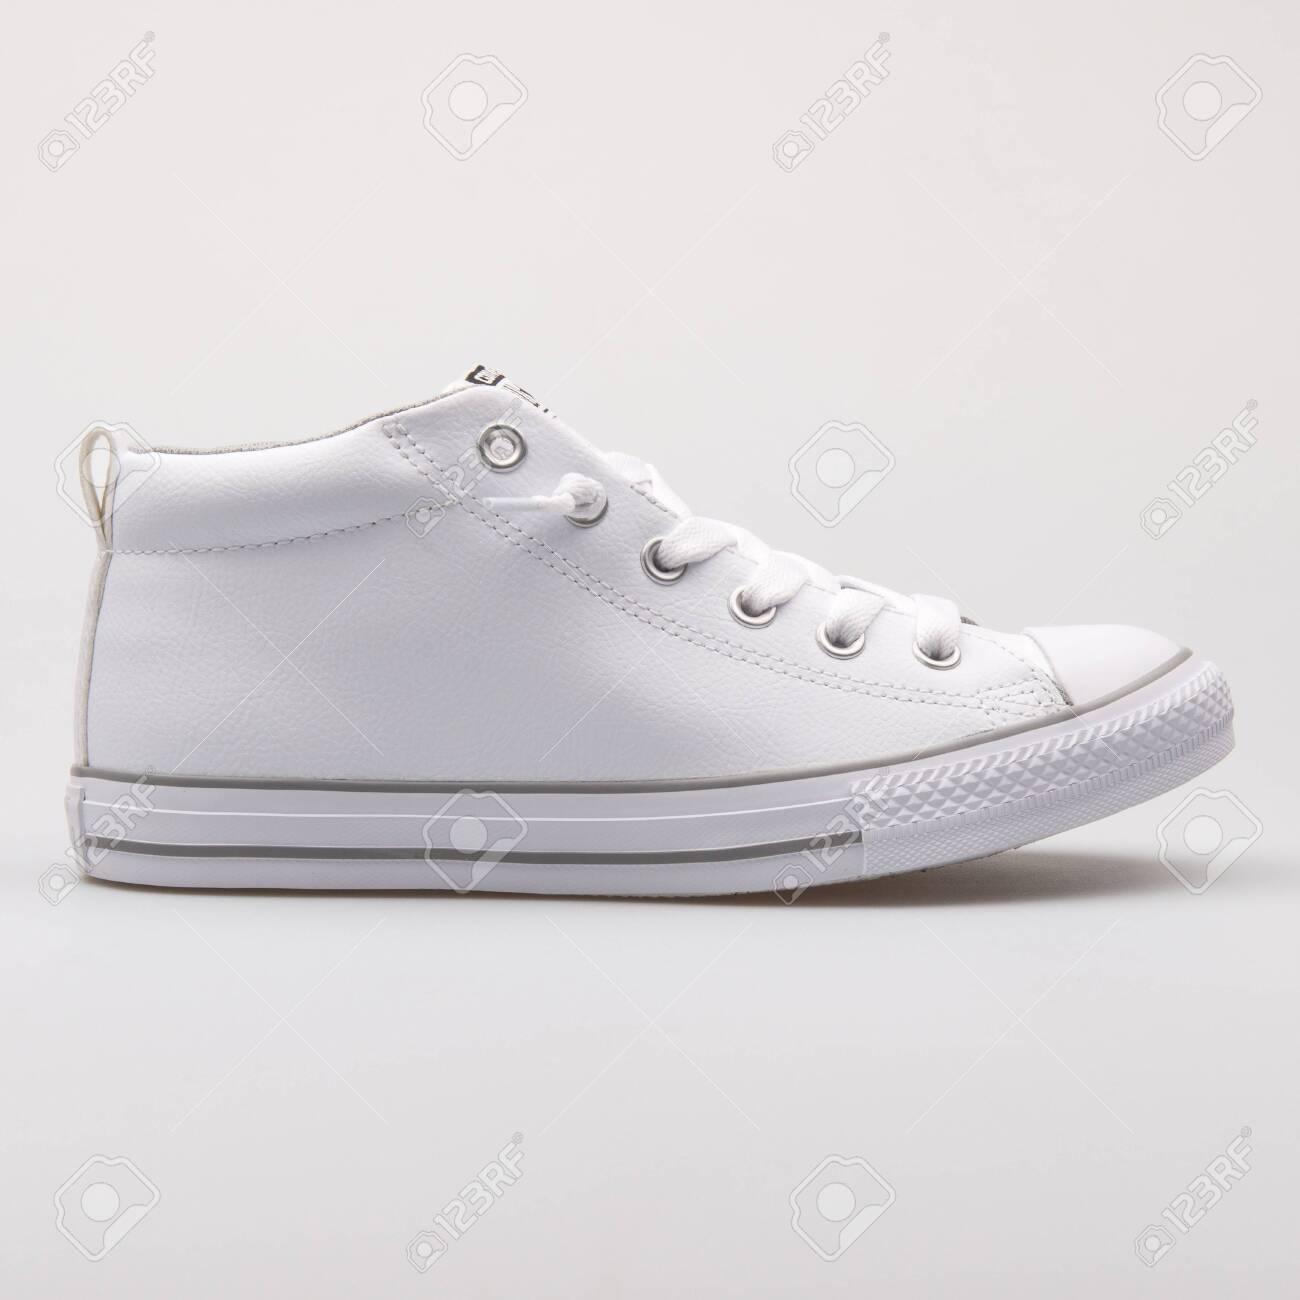 converse mid sneaker Online Shopping for Women, Men, Kids Fashion ...